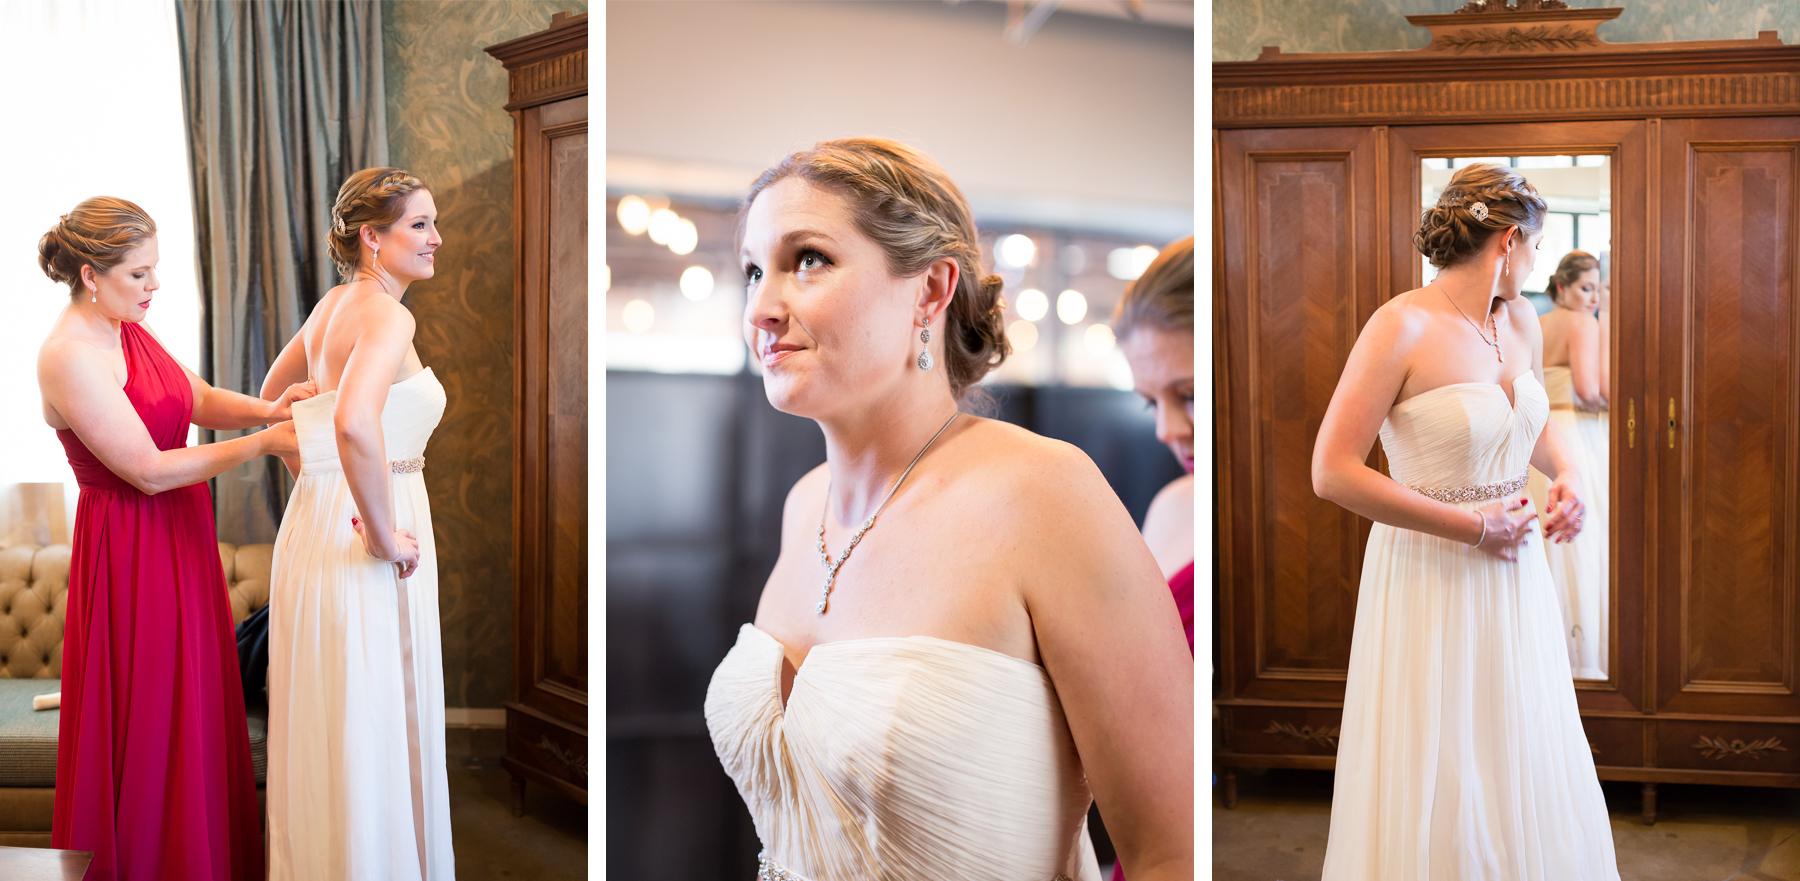 union-on-eighth-bridal-suite.jpg